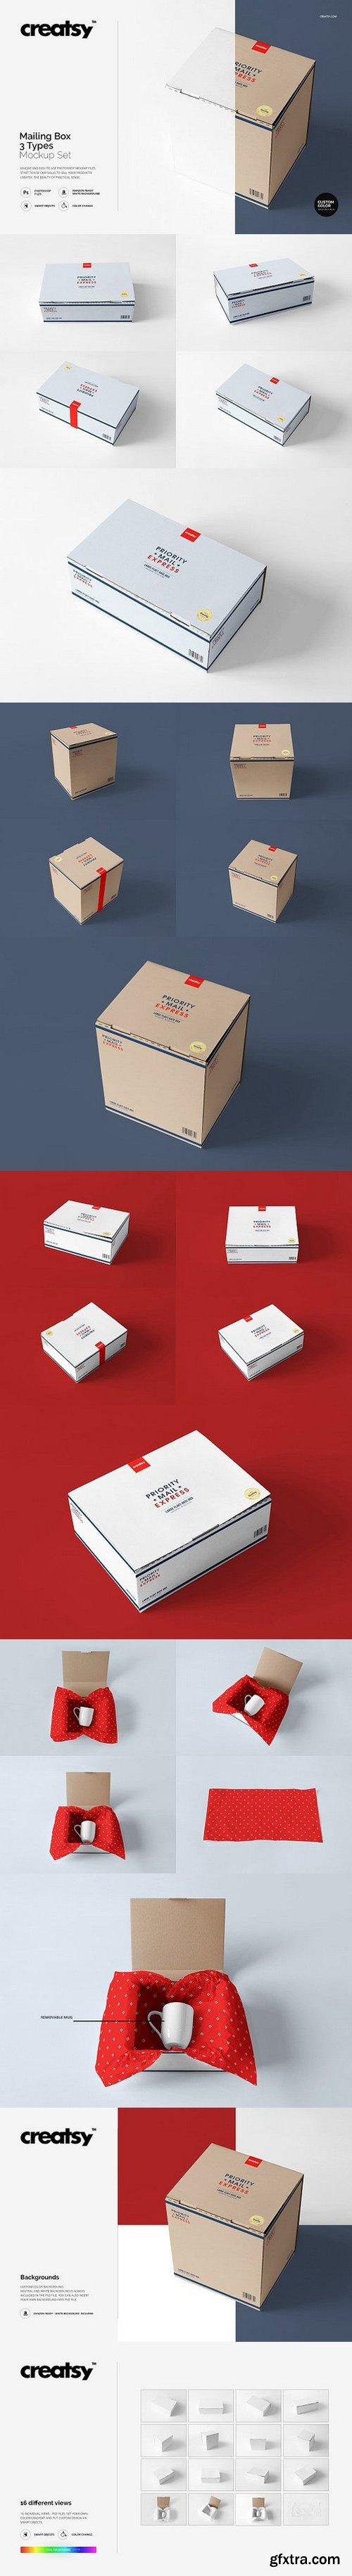 CM - Mailing Box 3 Types Mockup Set 1144518